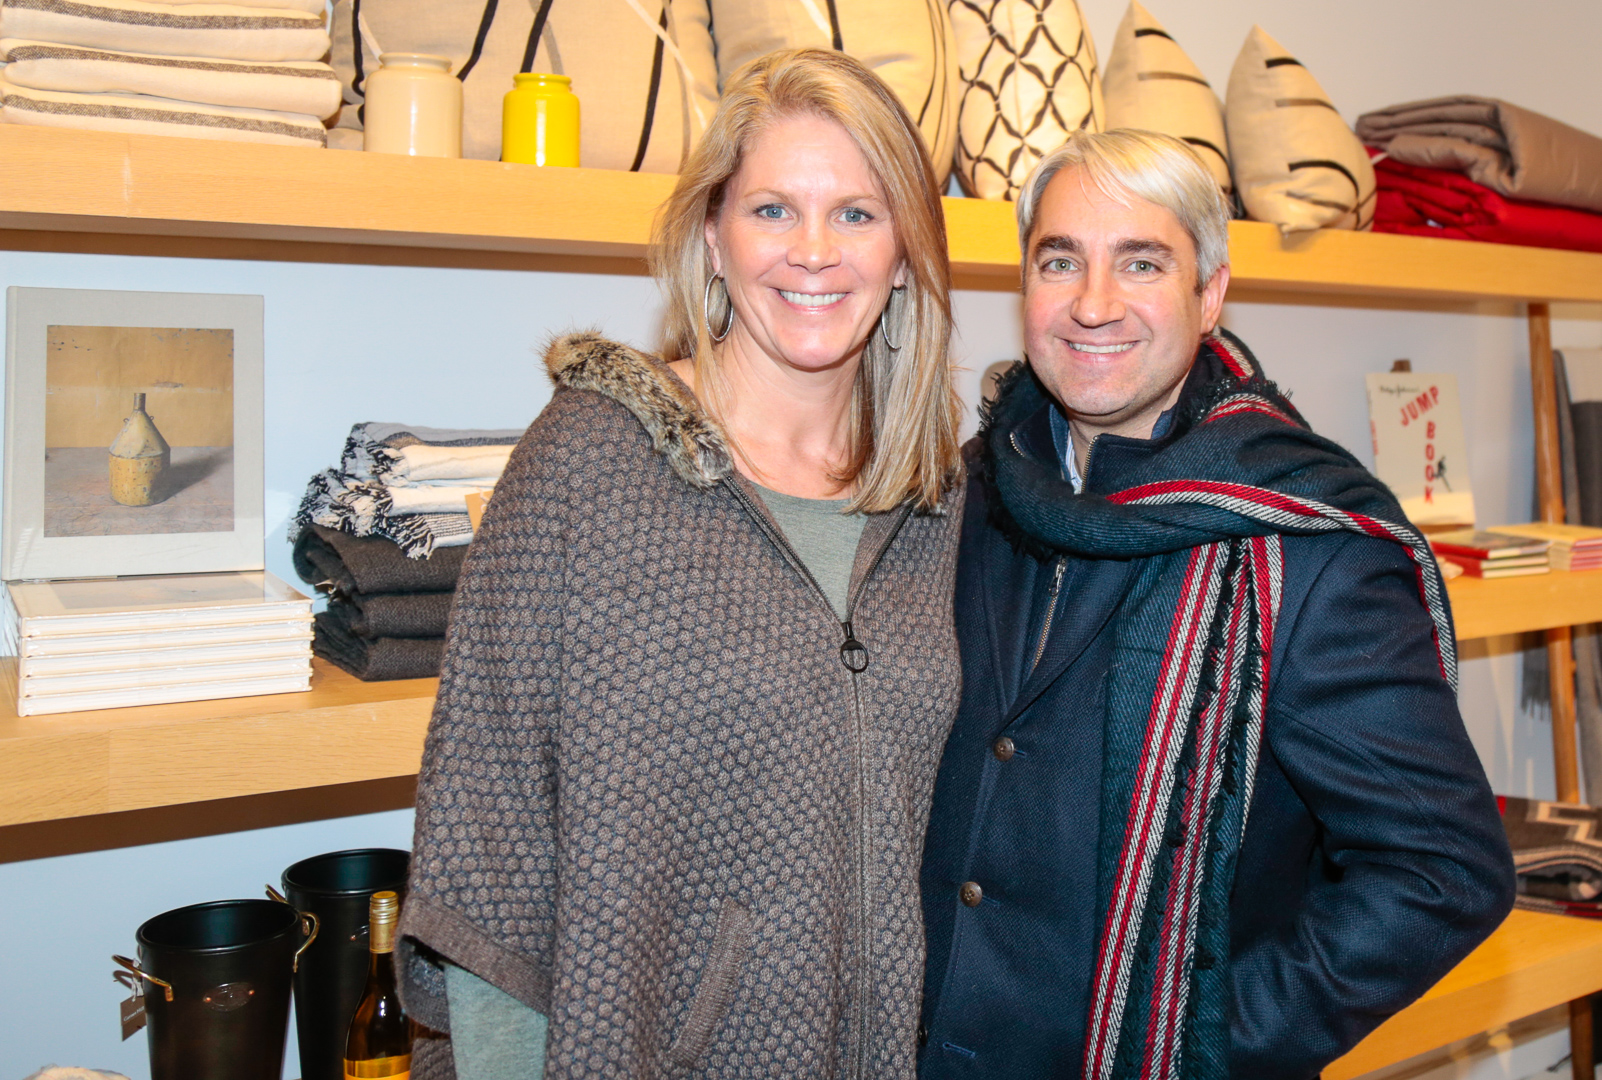 Hamptons designers Jennifer Mabley and her husband Austin Handler